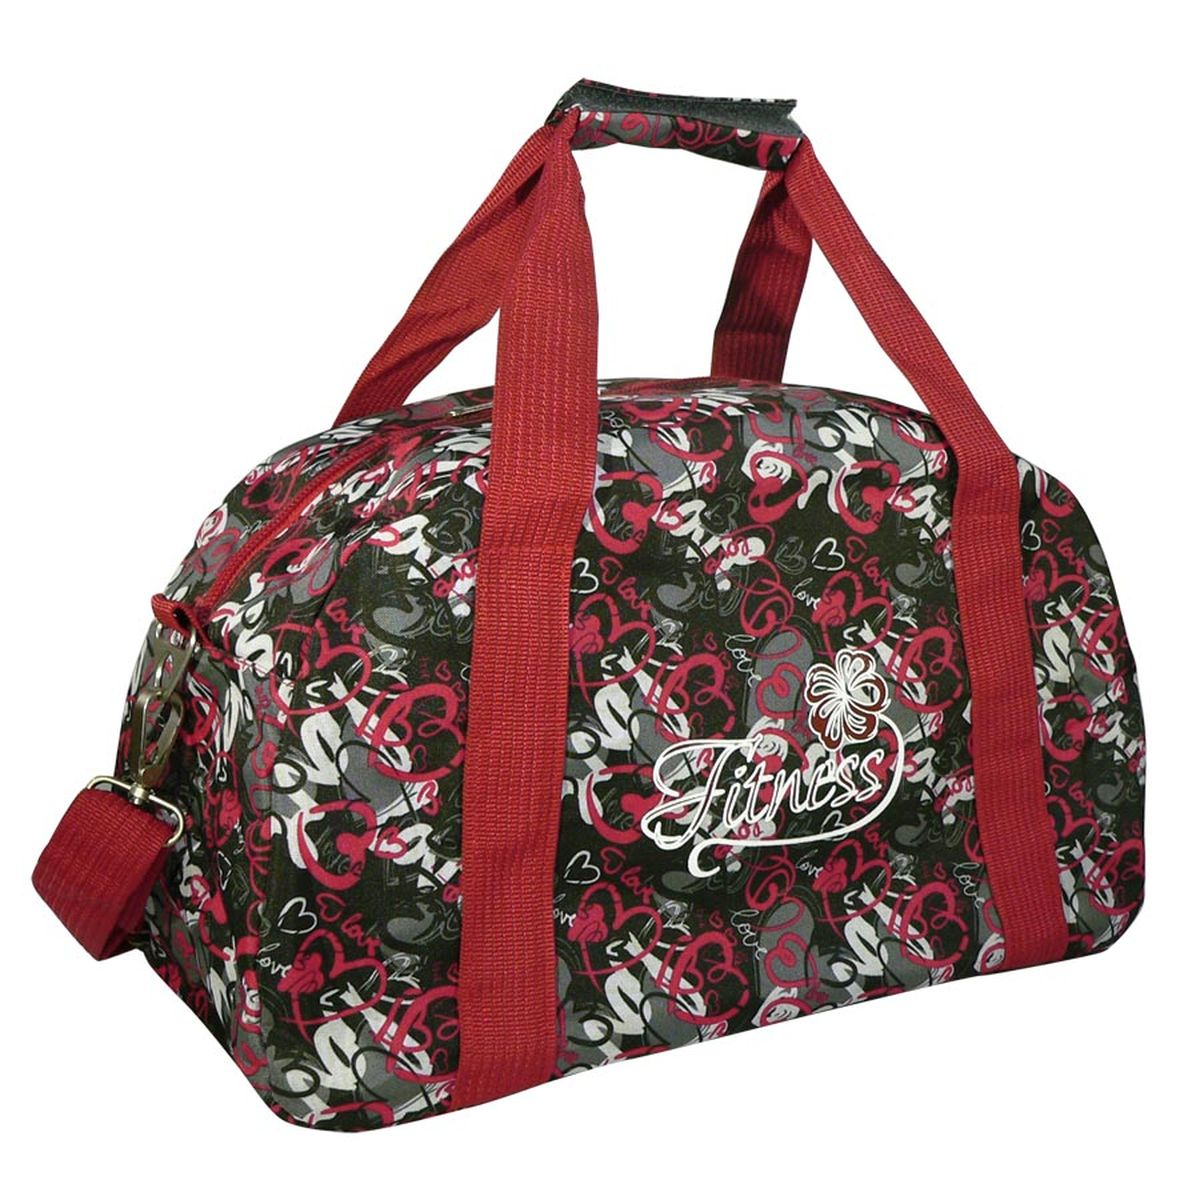 Сумка спортивная Polar, цвет: серый, красный, 20 л. 5997 сумка спортивная polar цвет темно синий 46 5 л 5986